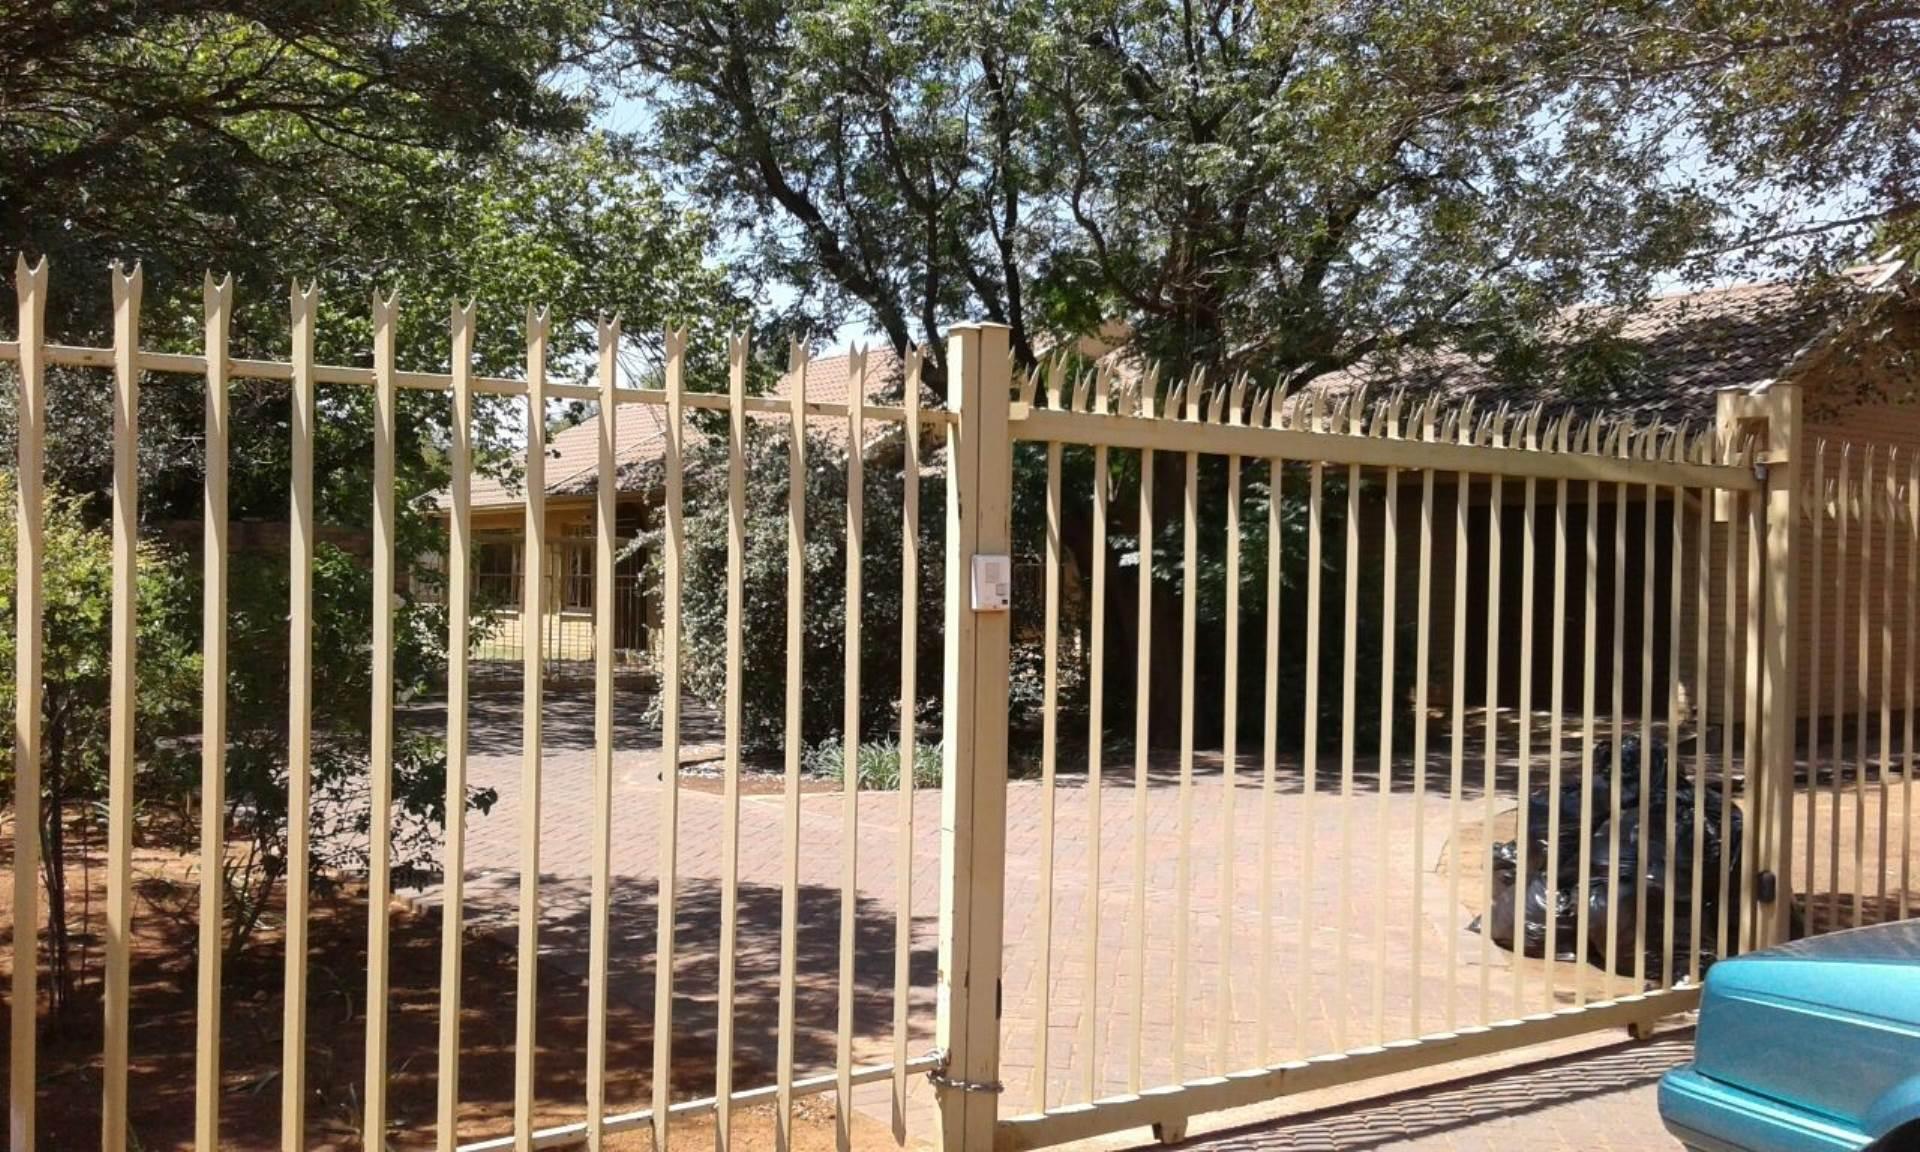 3 BedroomHouse For Sale In Universitas